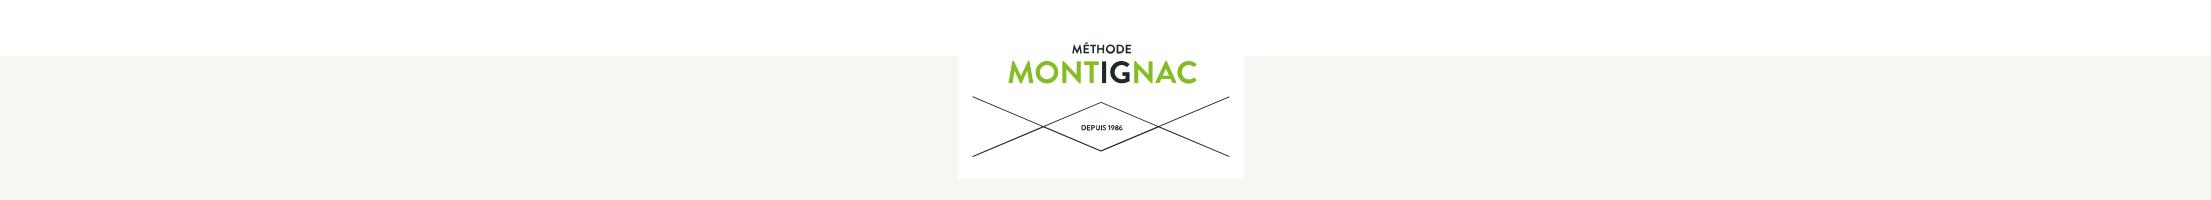 Logo Bandeau Intercalaire Montignac